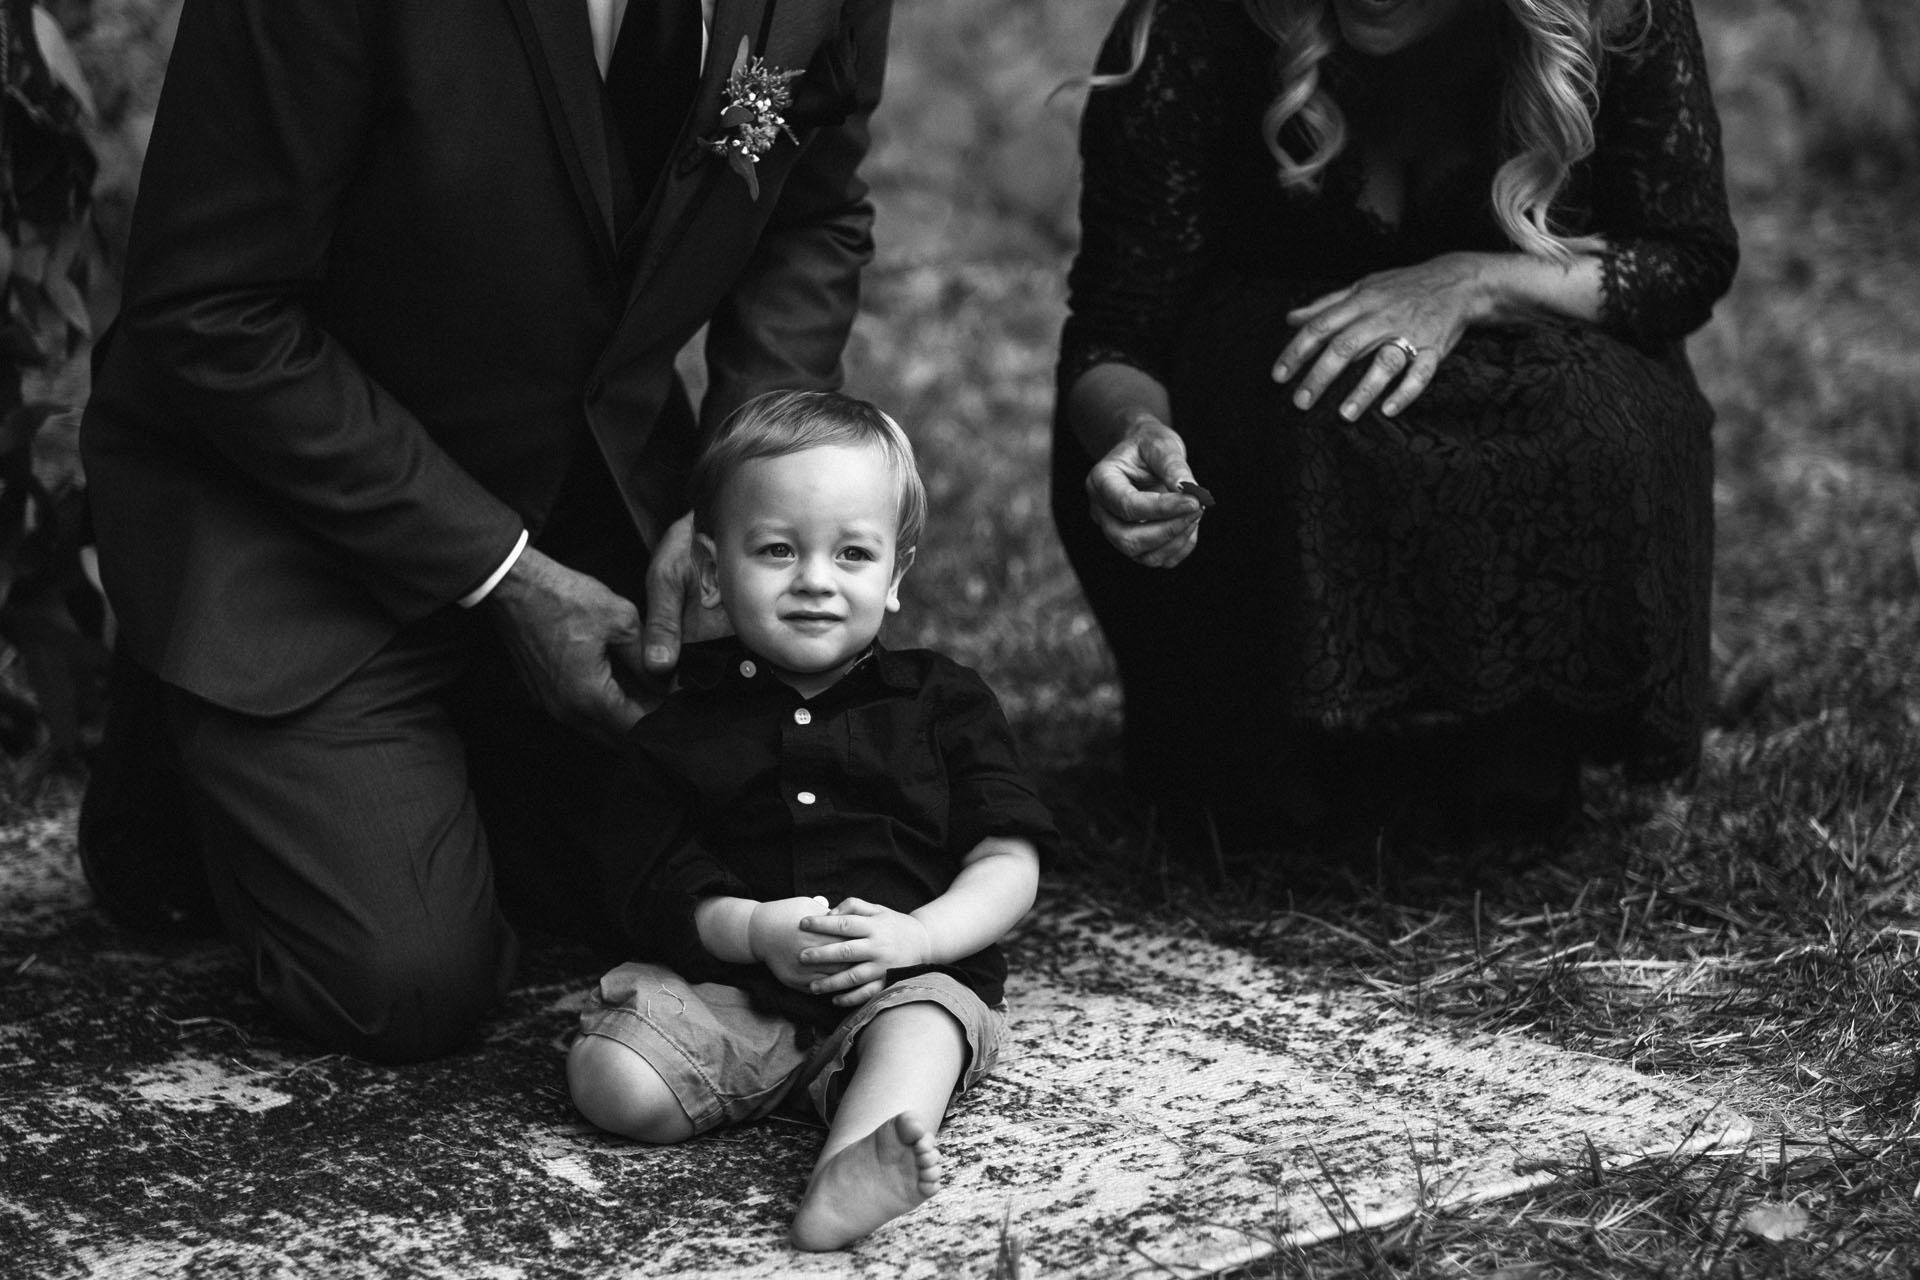 10-7-17 Devon and Jordan's Wedding-130.jpg